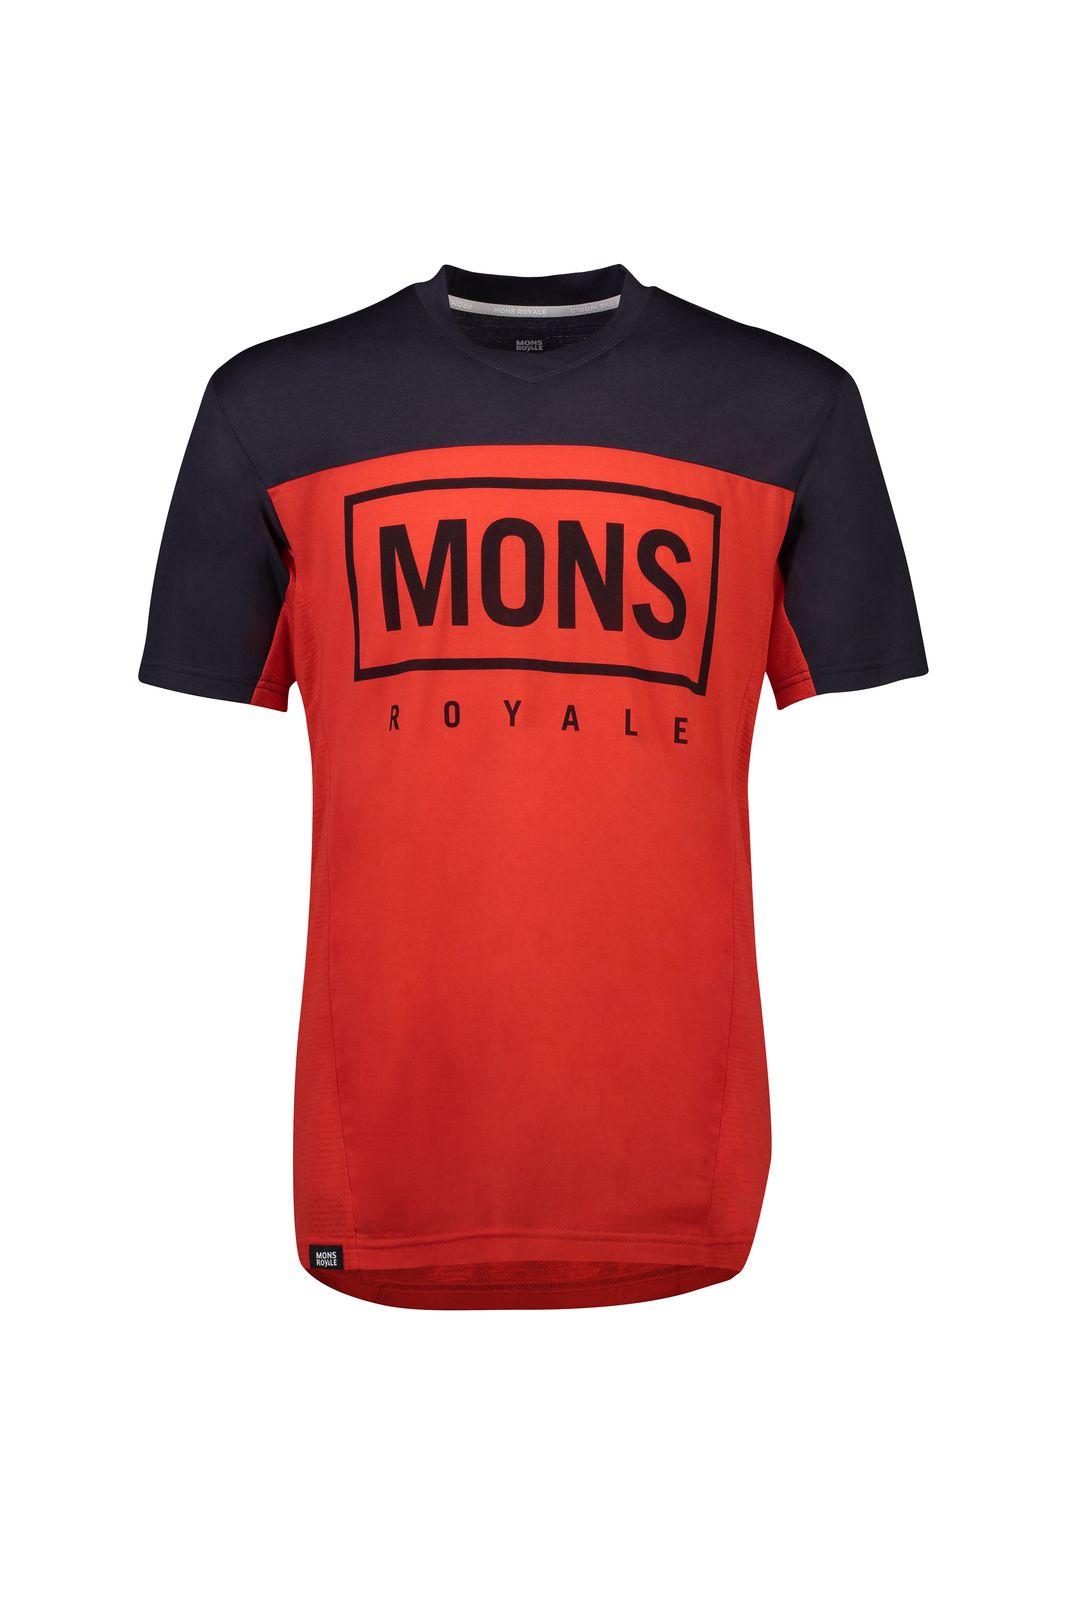 MONS ROYALE Redwood Enduro VT - Cykeltrøje - Rød/Blå | Jerseys